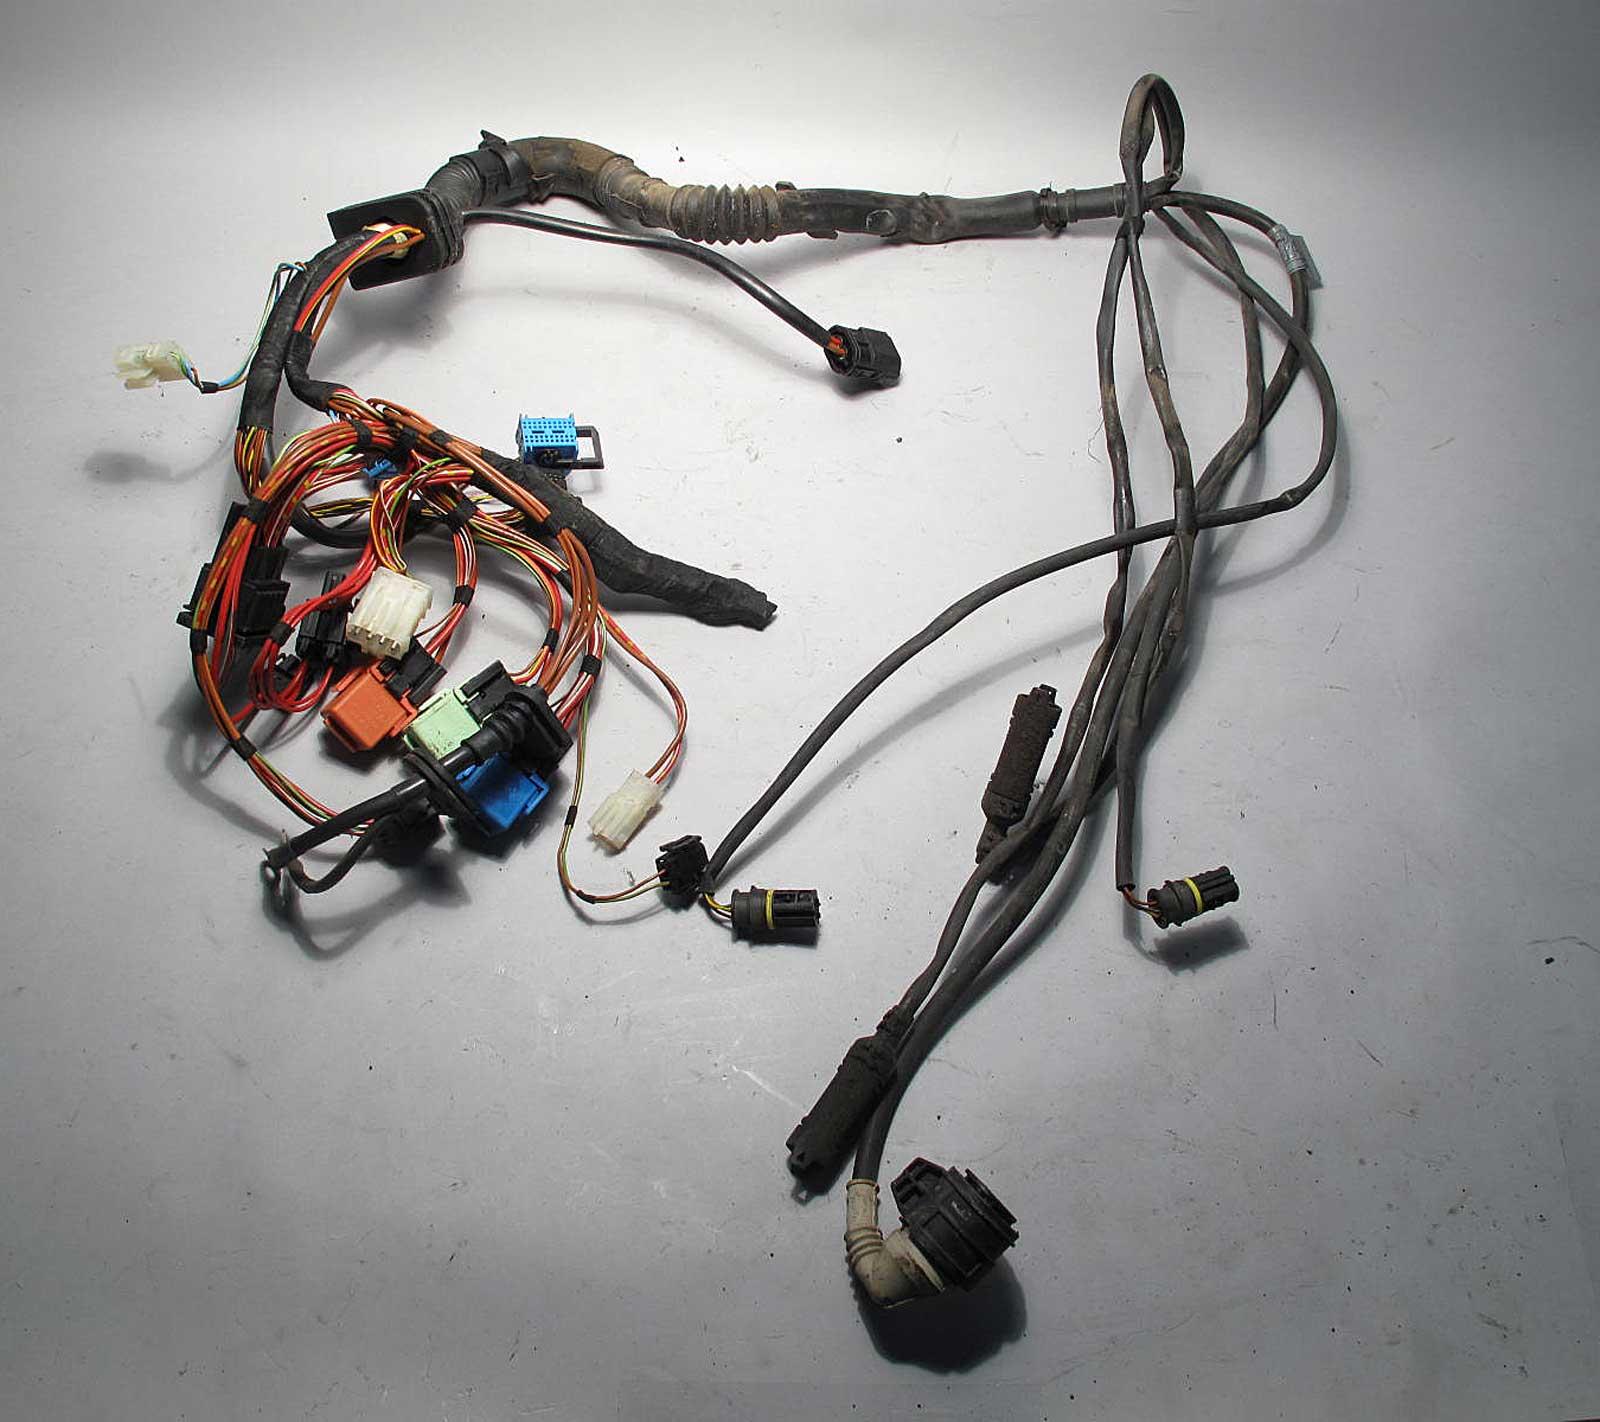 hight resolution of 1976 bmw 2002 wiring harness 28 wiring diagram images bmw r80 wiring schematic bmw r80 wiring